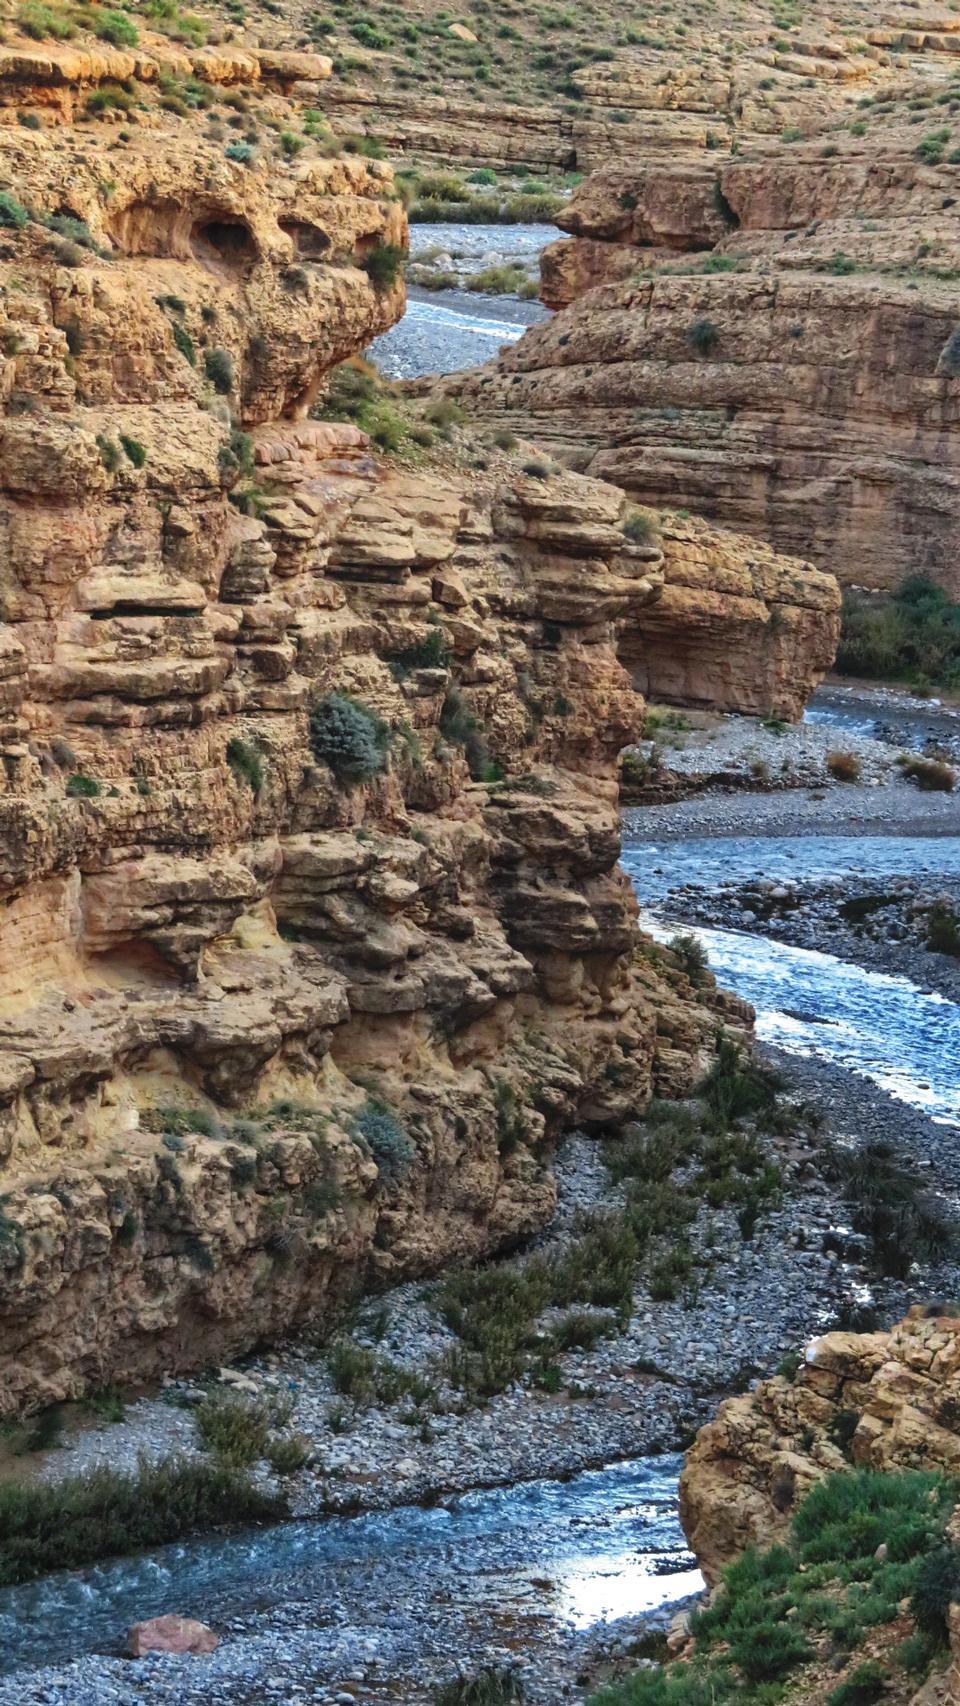 Ounila Valley Landscape. Morocco